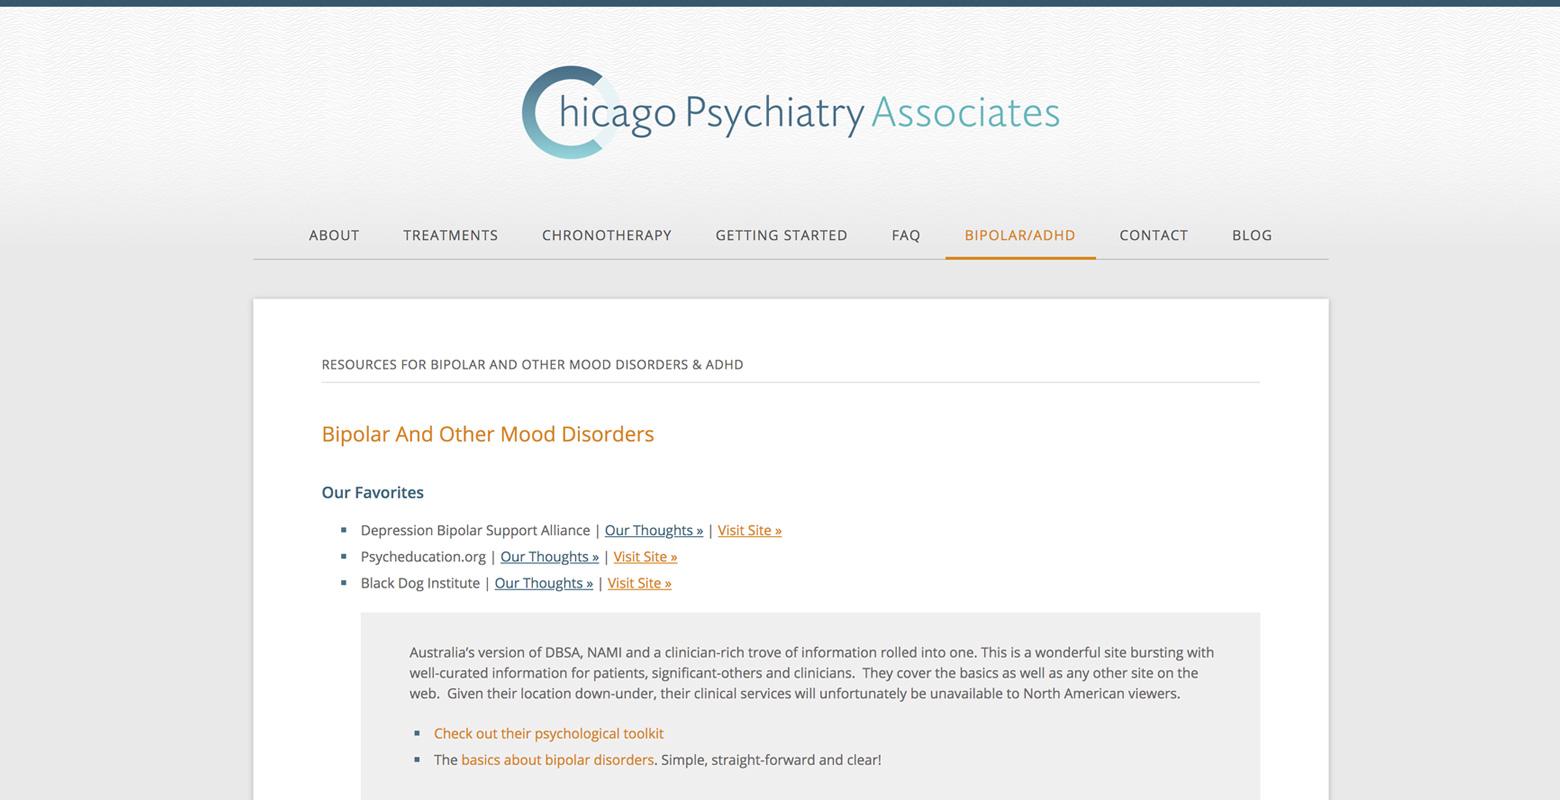 Chicago Psychiatry Associates